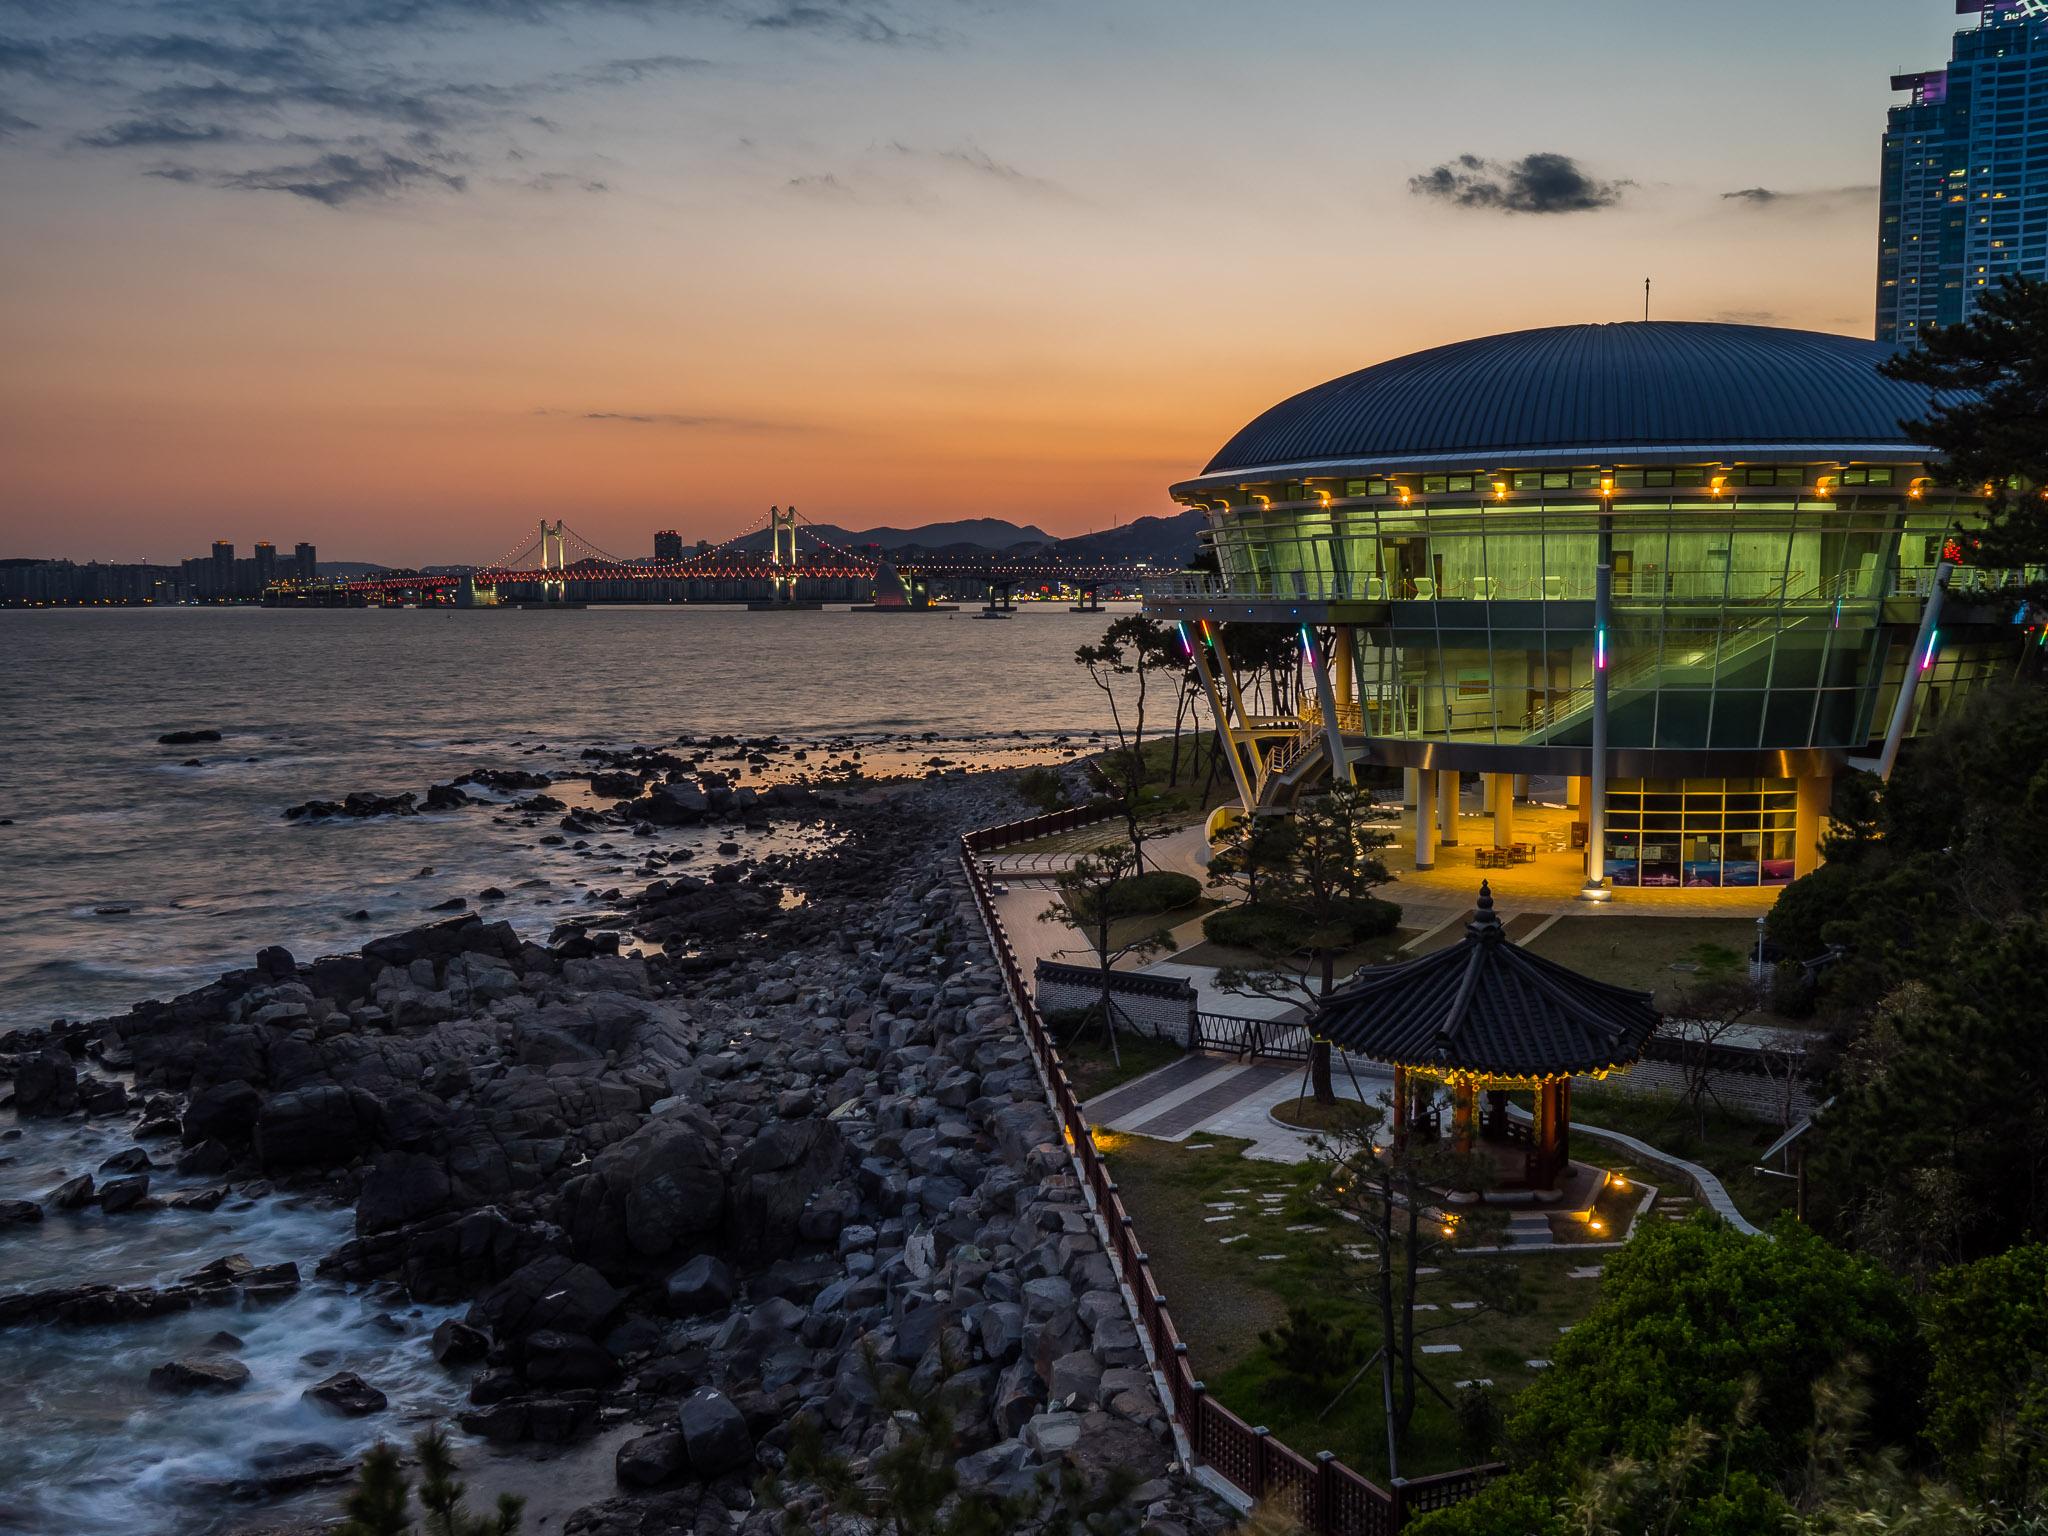 DongBaek Island View